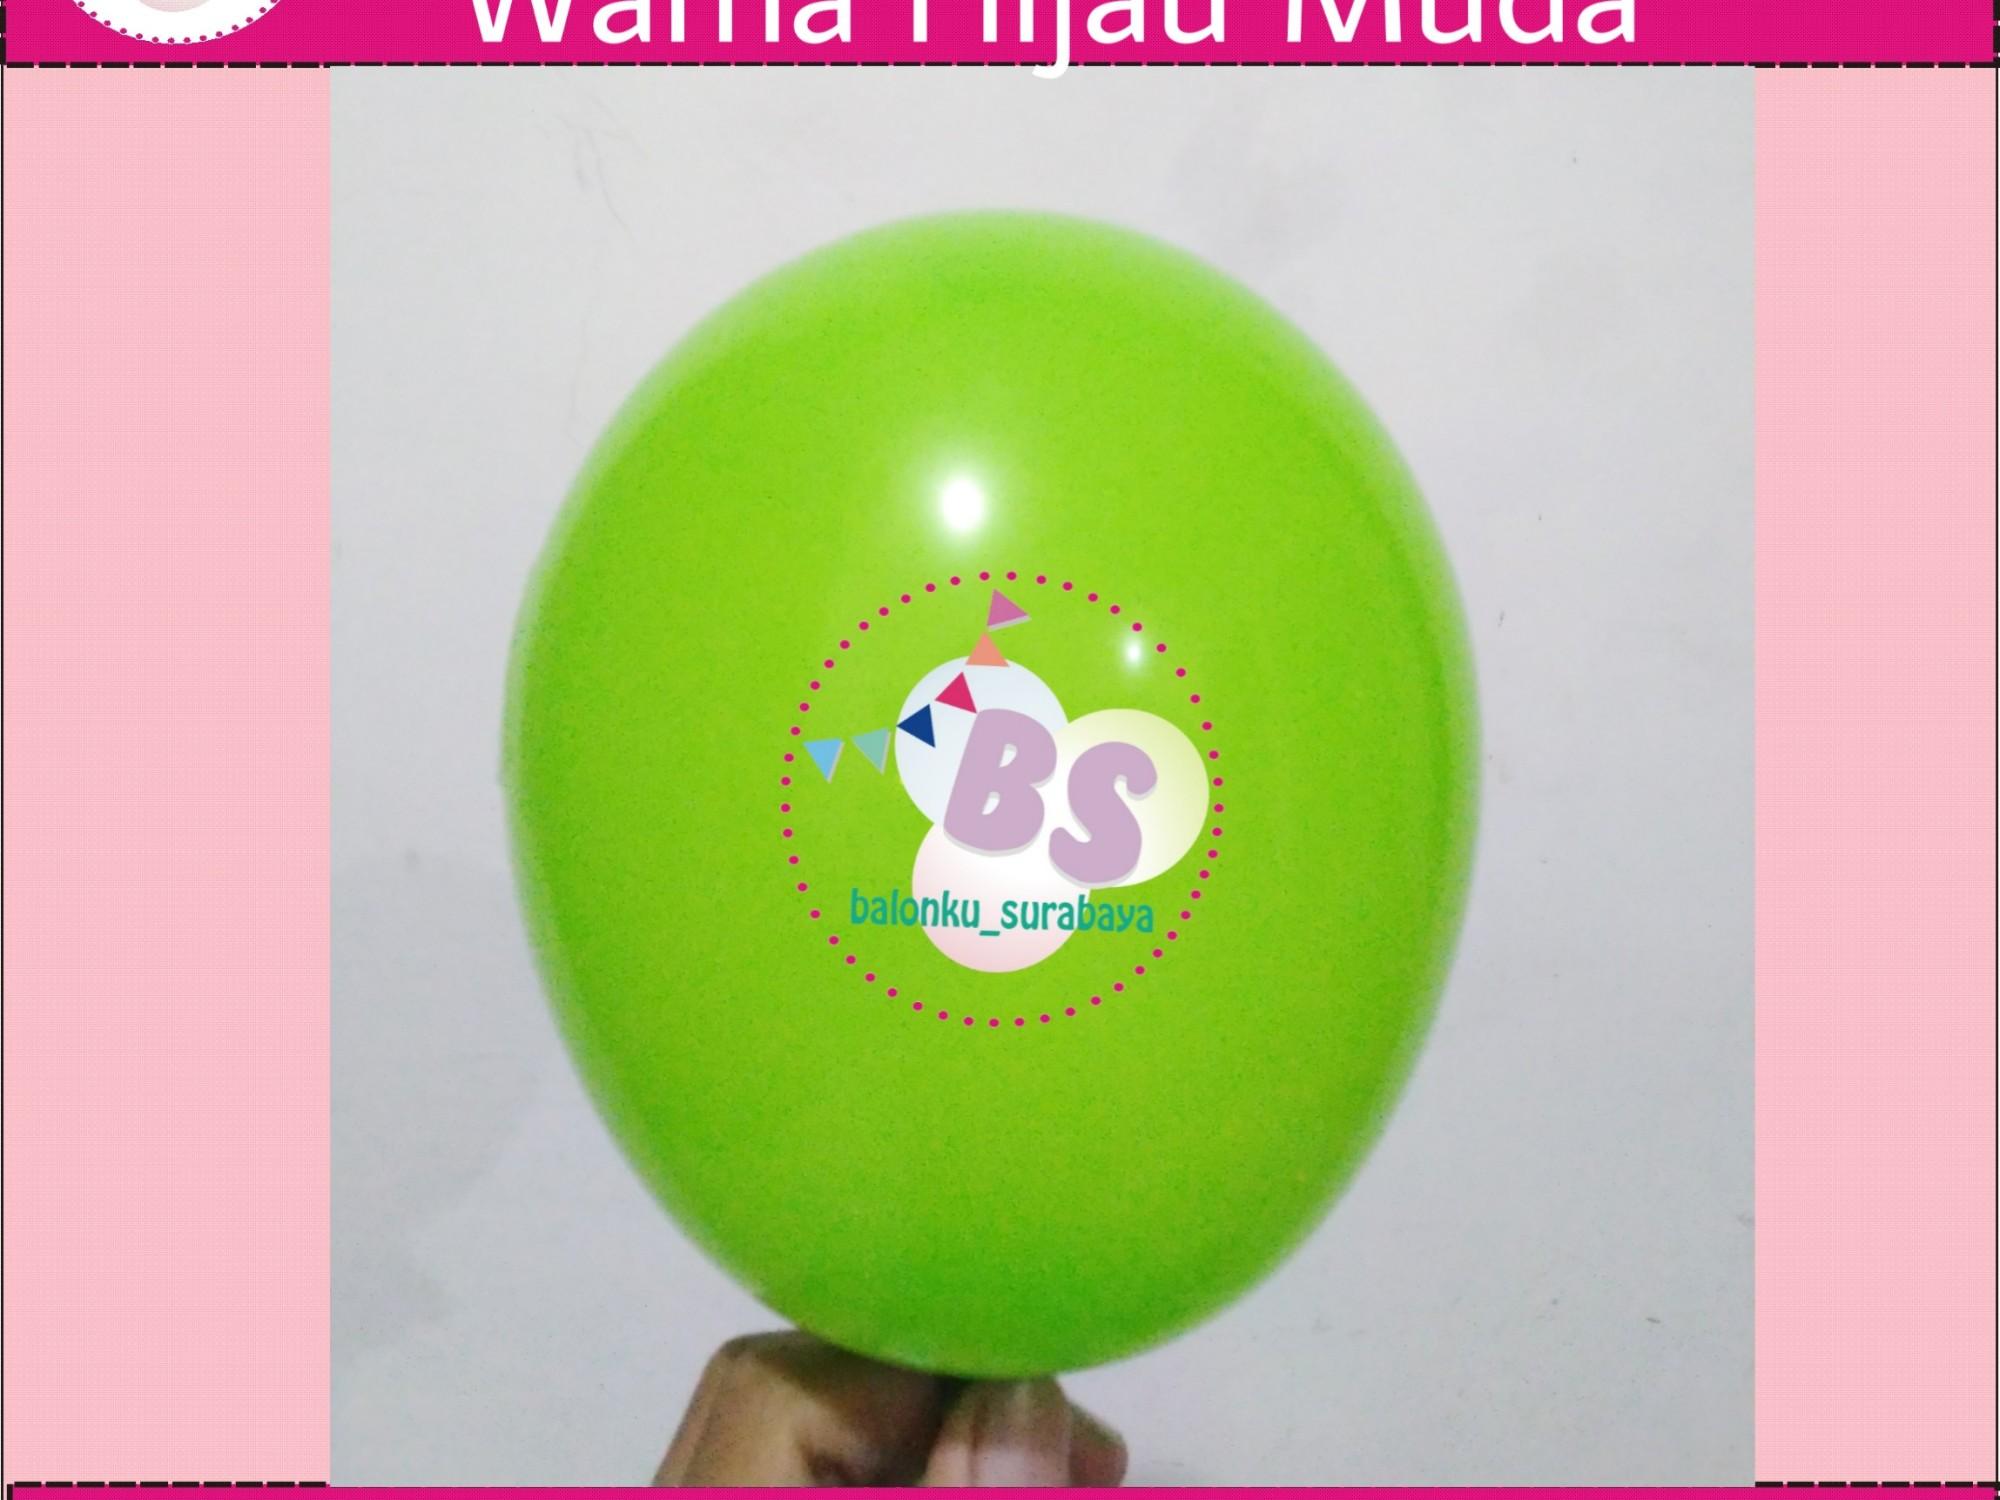 jual balon latex 5 inch Hijau Muda, BAlon Gas,Bunga dekorasi,Rangkaian bunga artificial, Buket bunga, buket bunga mawar, harga buket bunga,Balon sablon, balon Printing, balon promosi, , Perlengkapan ulang tahun, Balon latex , balon doff, balon latex, balon doff merah, balon natal, balon agustusan, balon dekorasi, balonku Surabaya, 085733133529